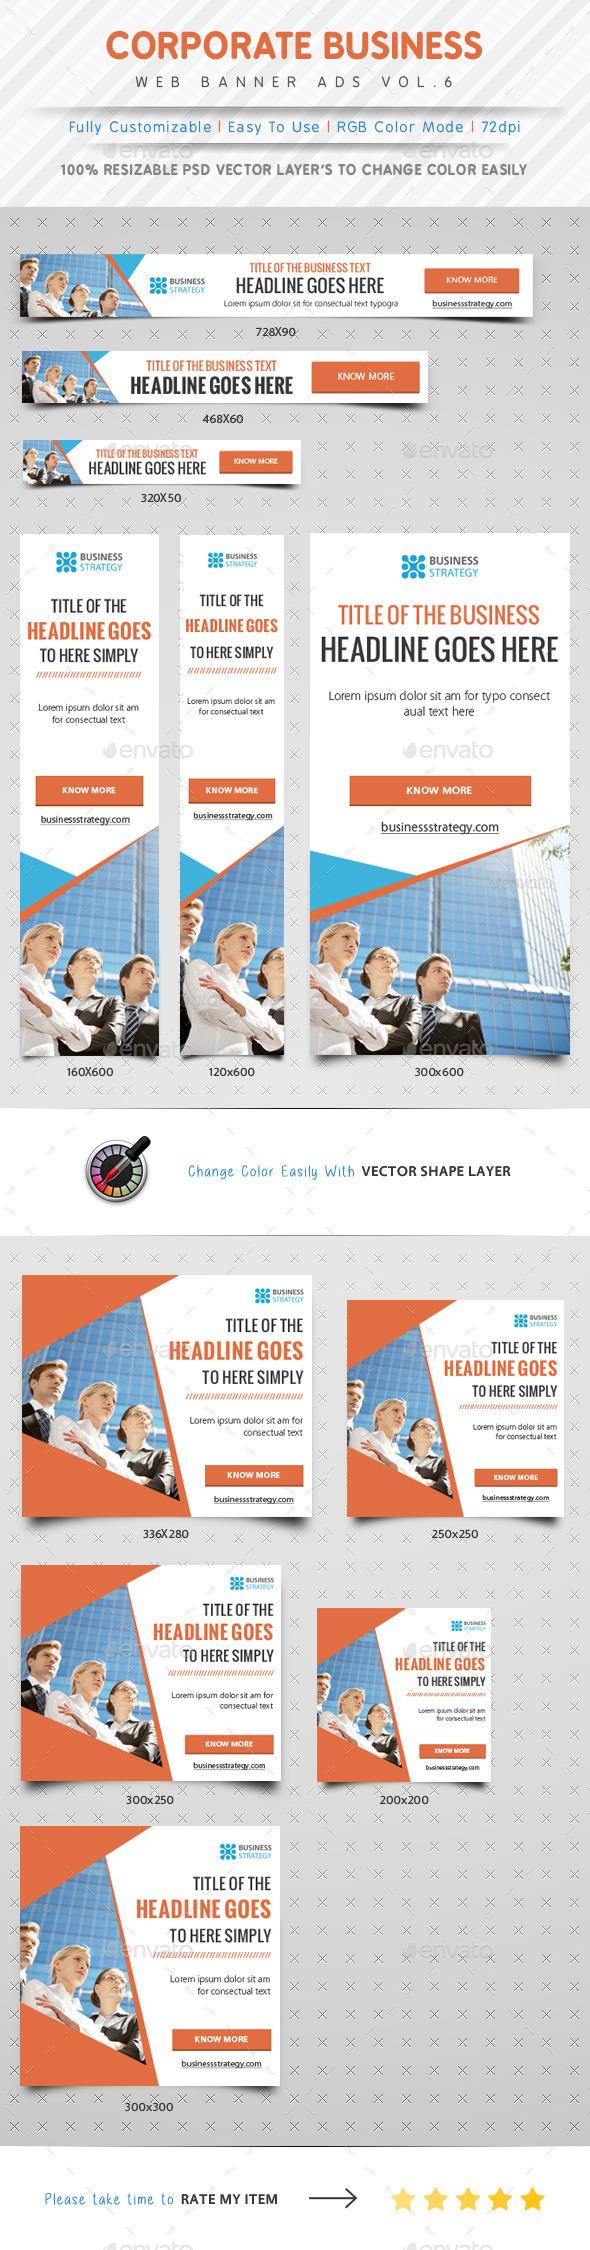 GraphicRiver Corporate Web Banner Ads Vol.6 9989912